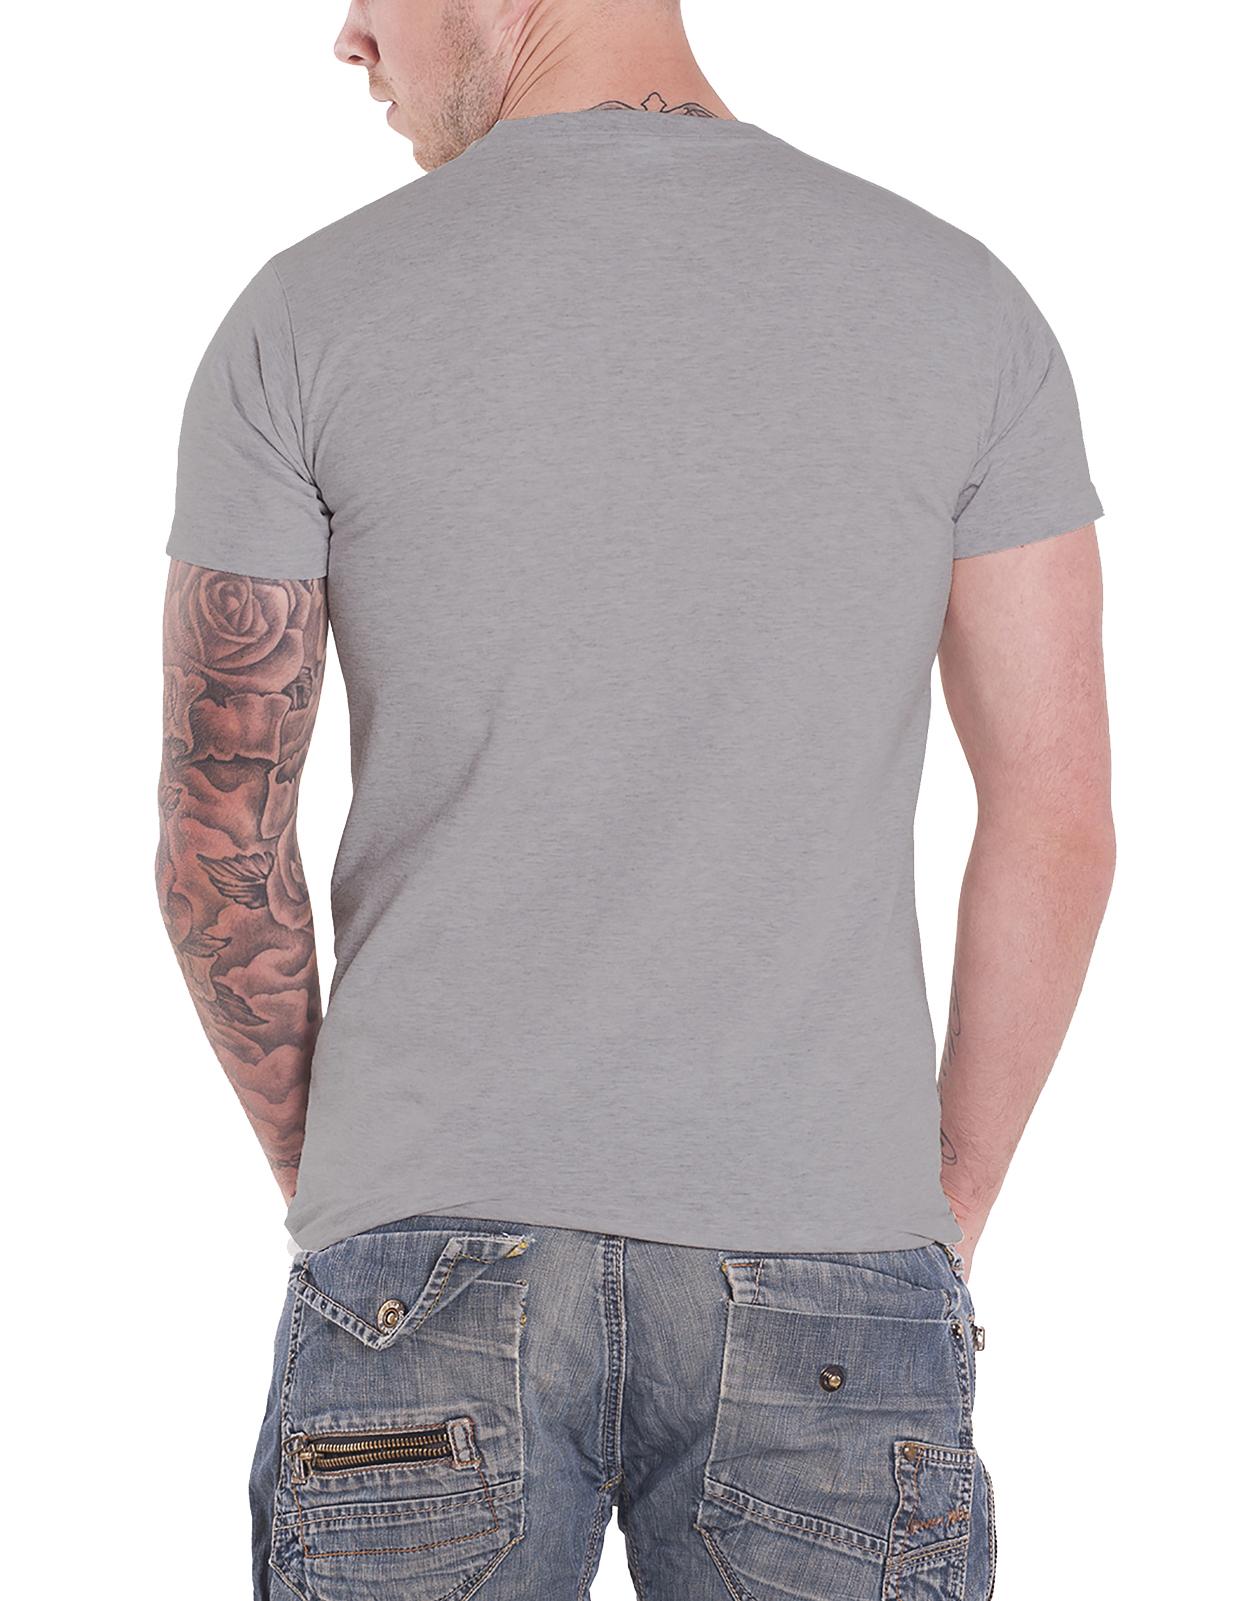 Official-Motley-Crue-T-Shirt-Shout-at-the-Devil-The-Dirt-Tour-Band-Logo-Mens thumbnail 41